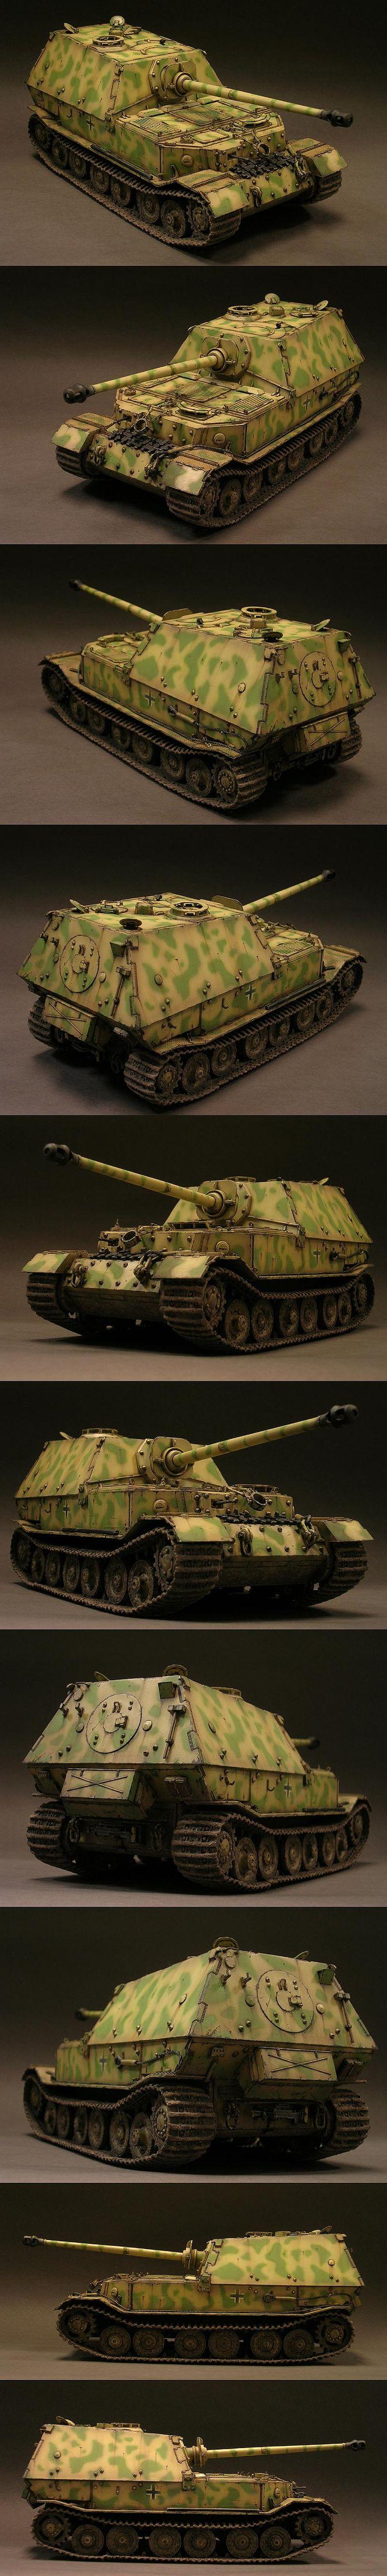 Panzerjager Tiger (P) Sd. Kfz. 184 Elefant 1/35 Scale Model